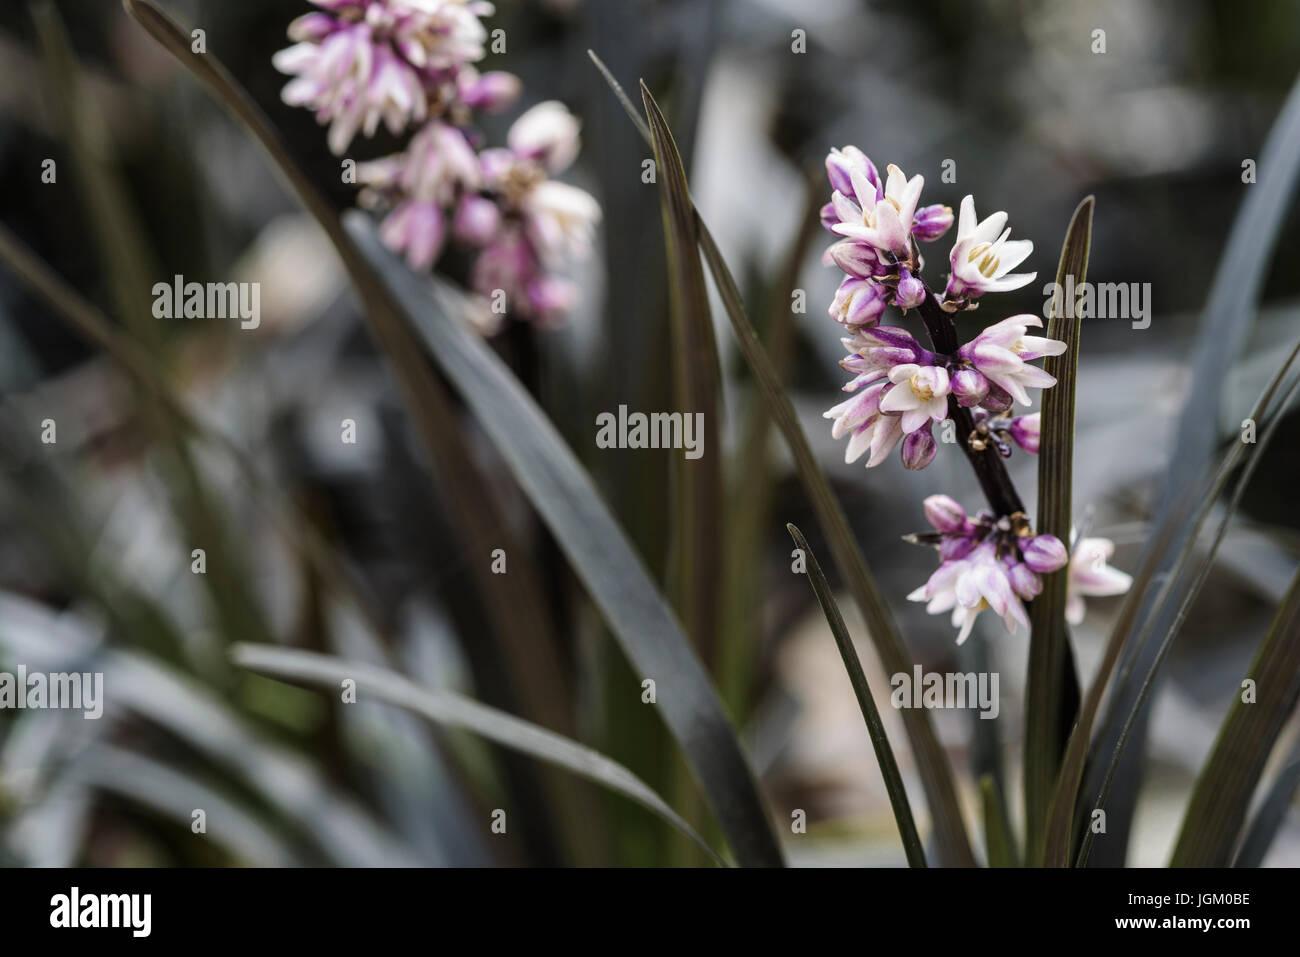 Ophiopogon Planiscapus hier, Lilyturf, Asparagaceae, Stockbild